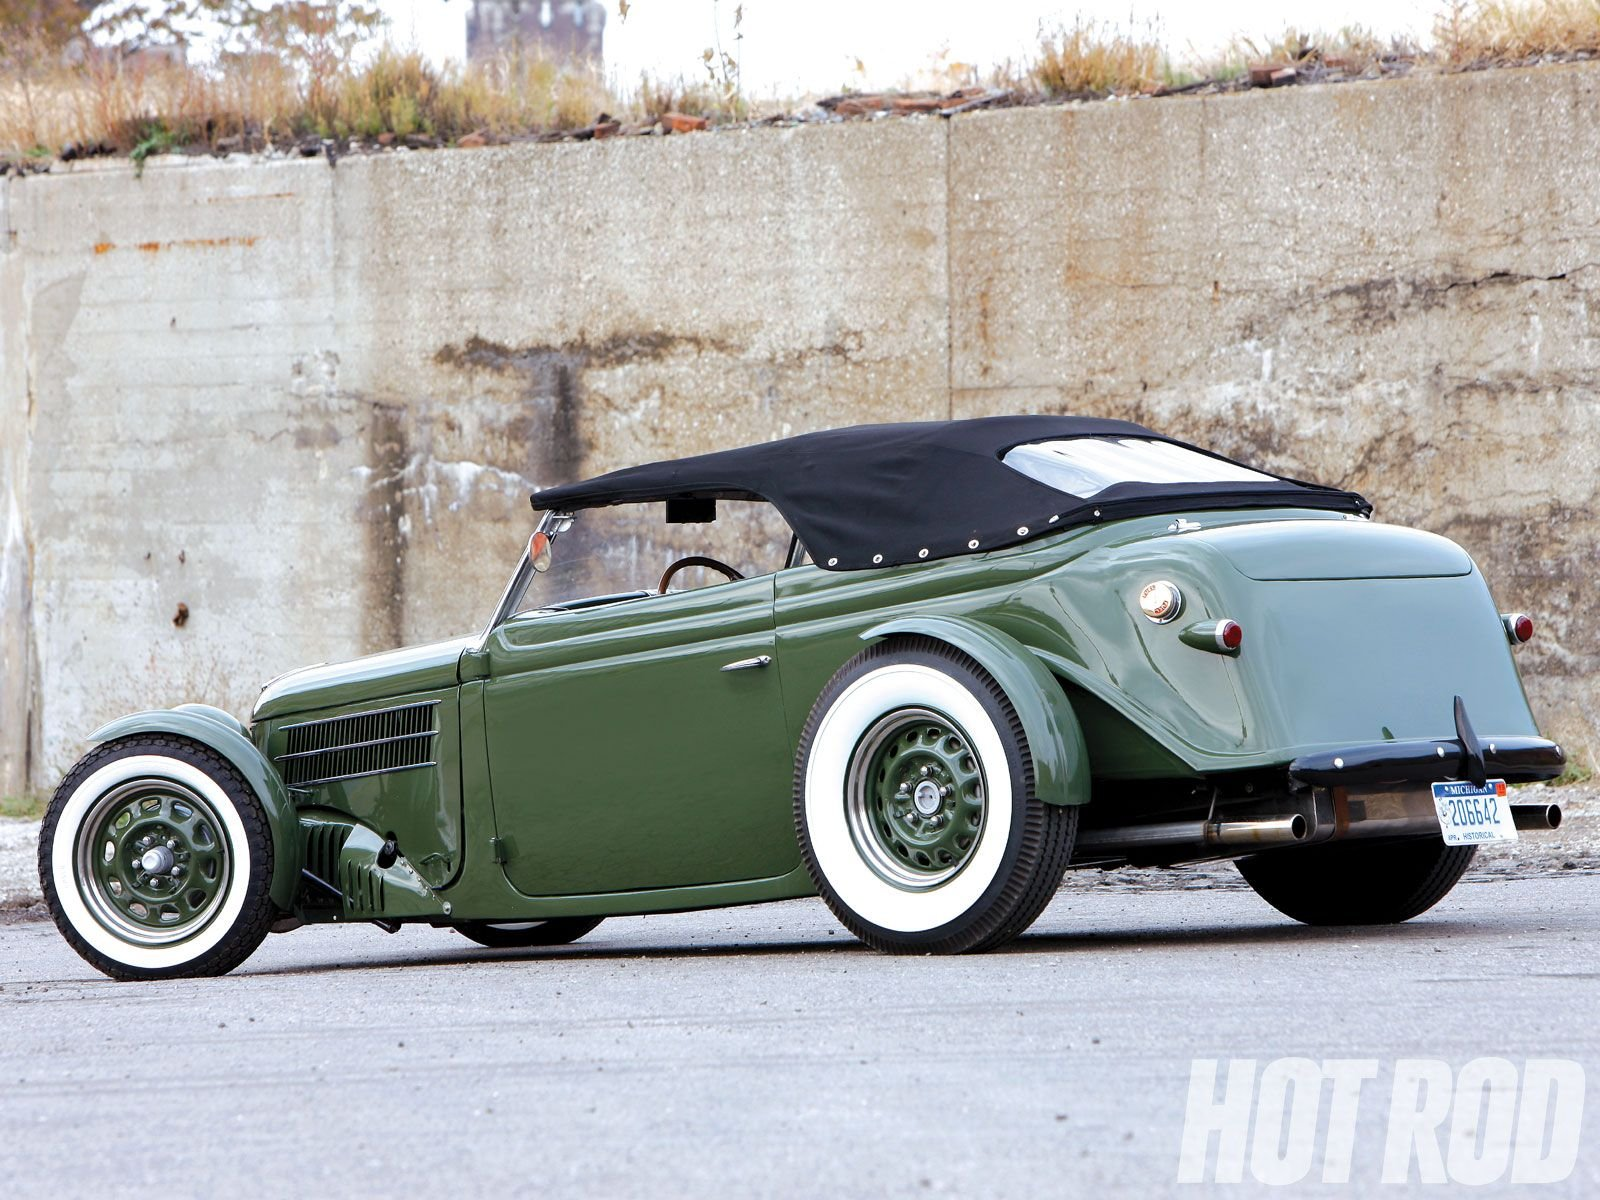 1936 Ford Phaeton Humpback Roadster Hotrod Hot Rod Custom Low Old ...